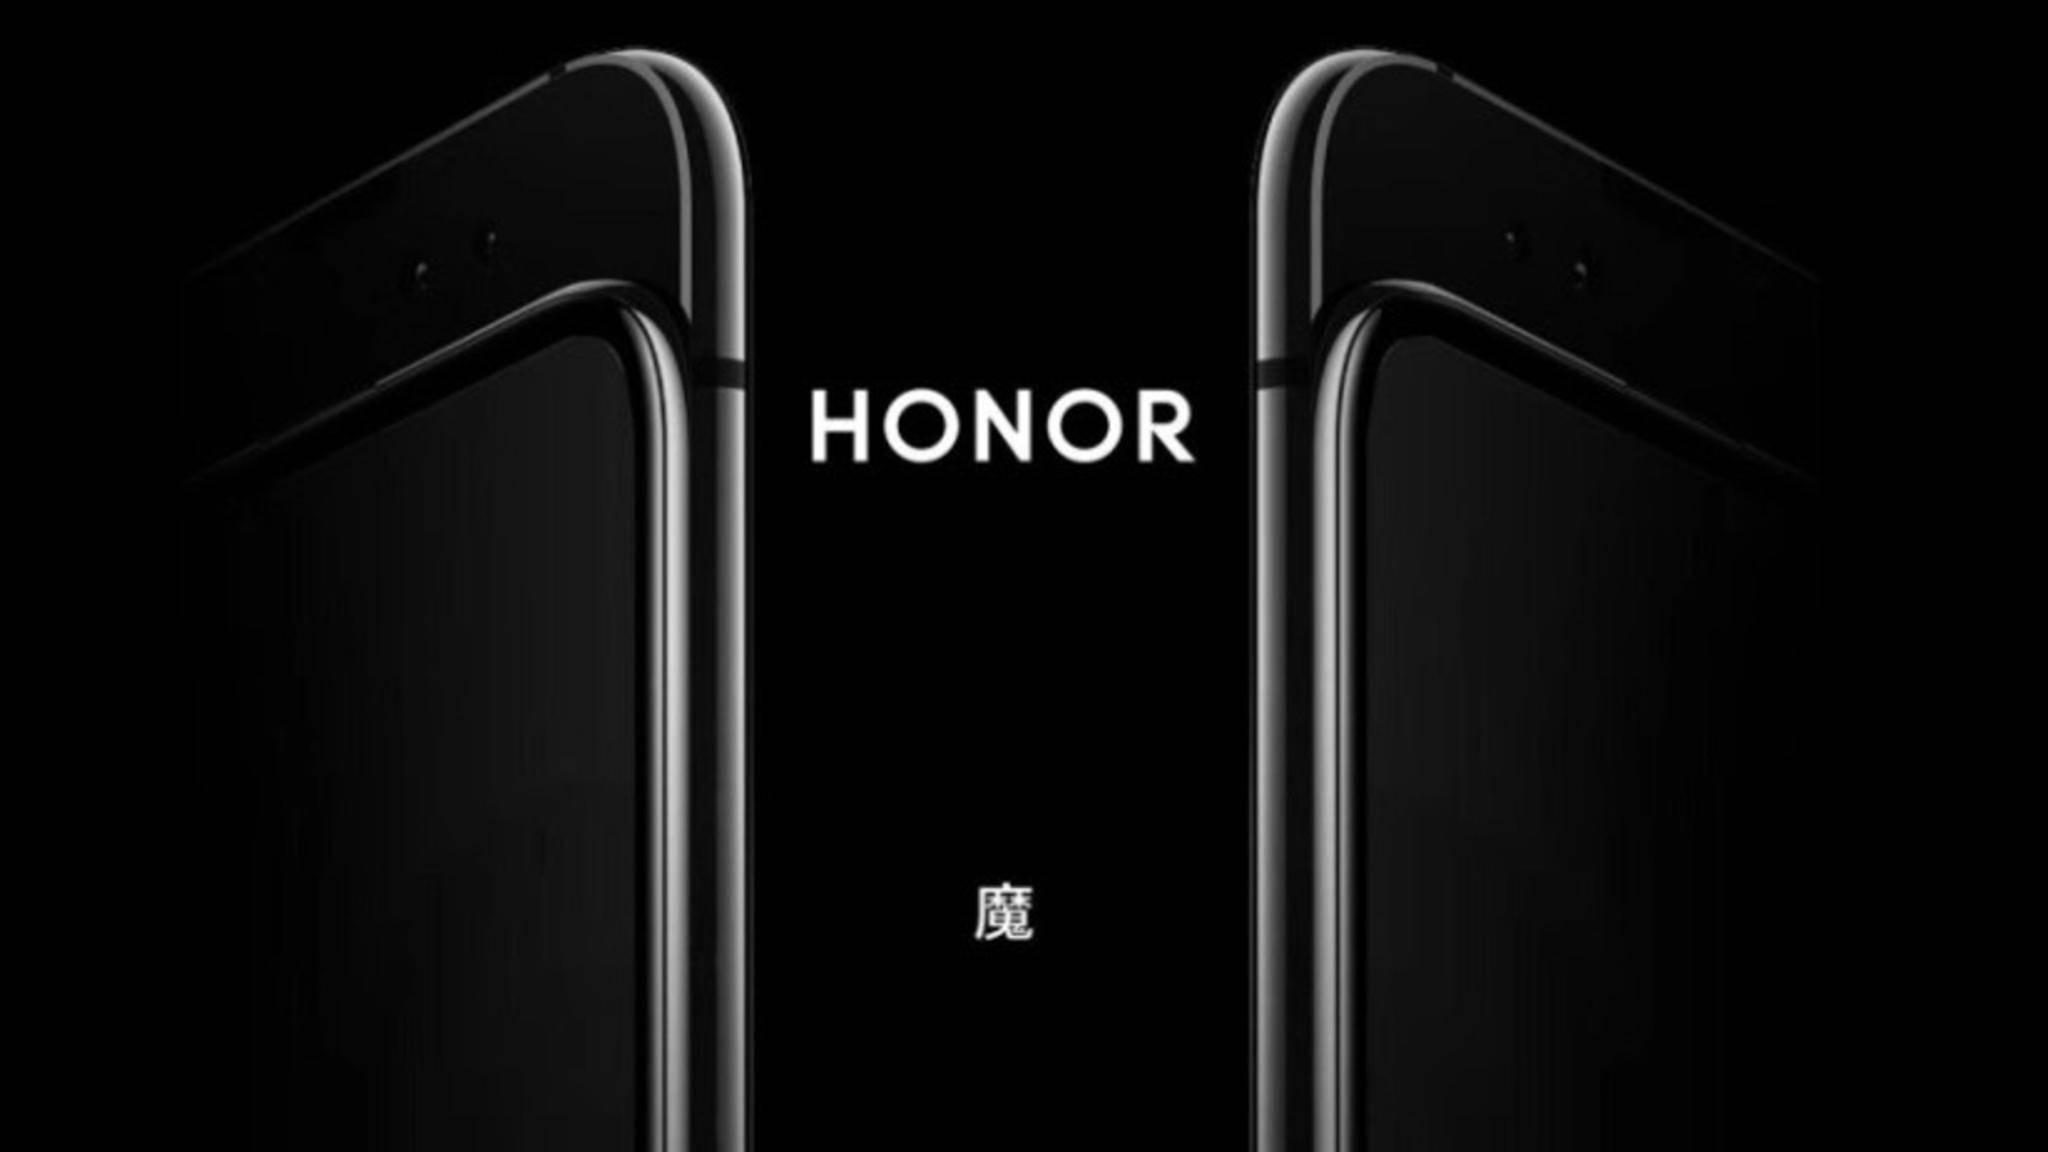 Das Honor Magic 2 soll einen ausfahrbaren Slider besitzen.